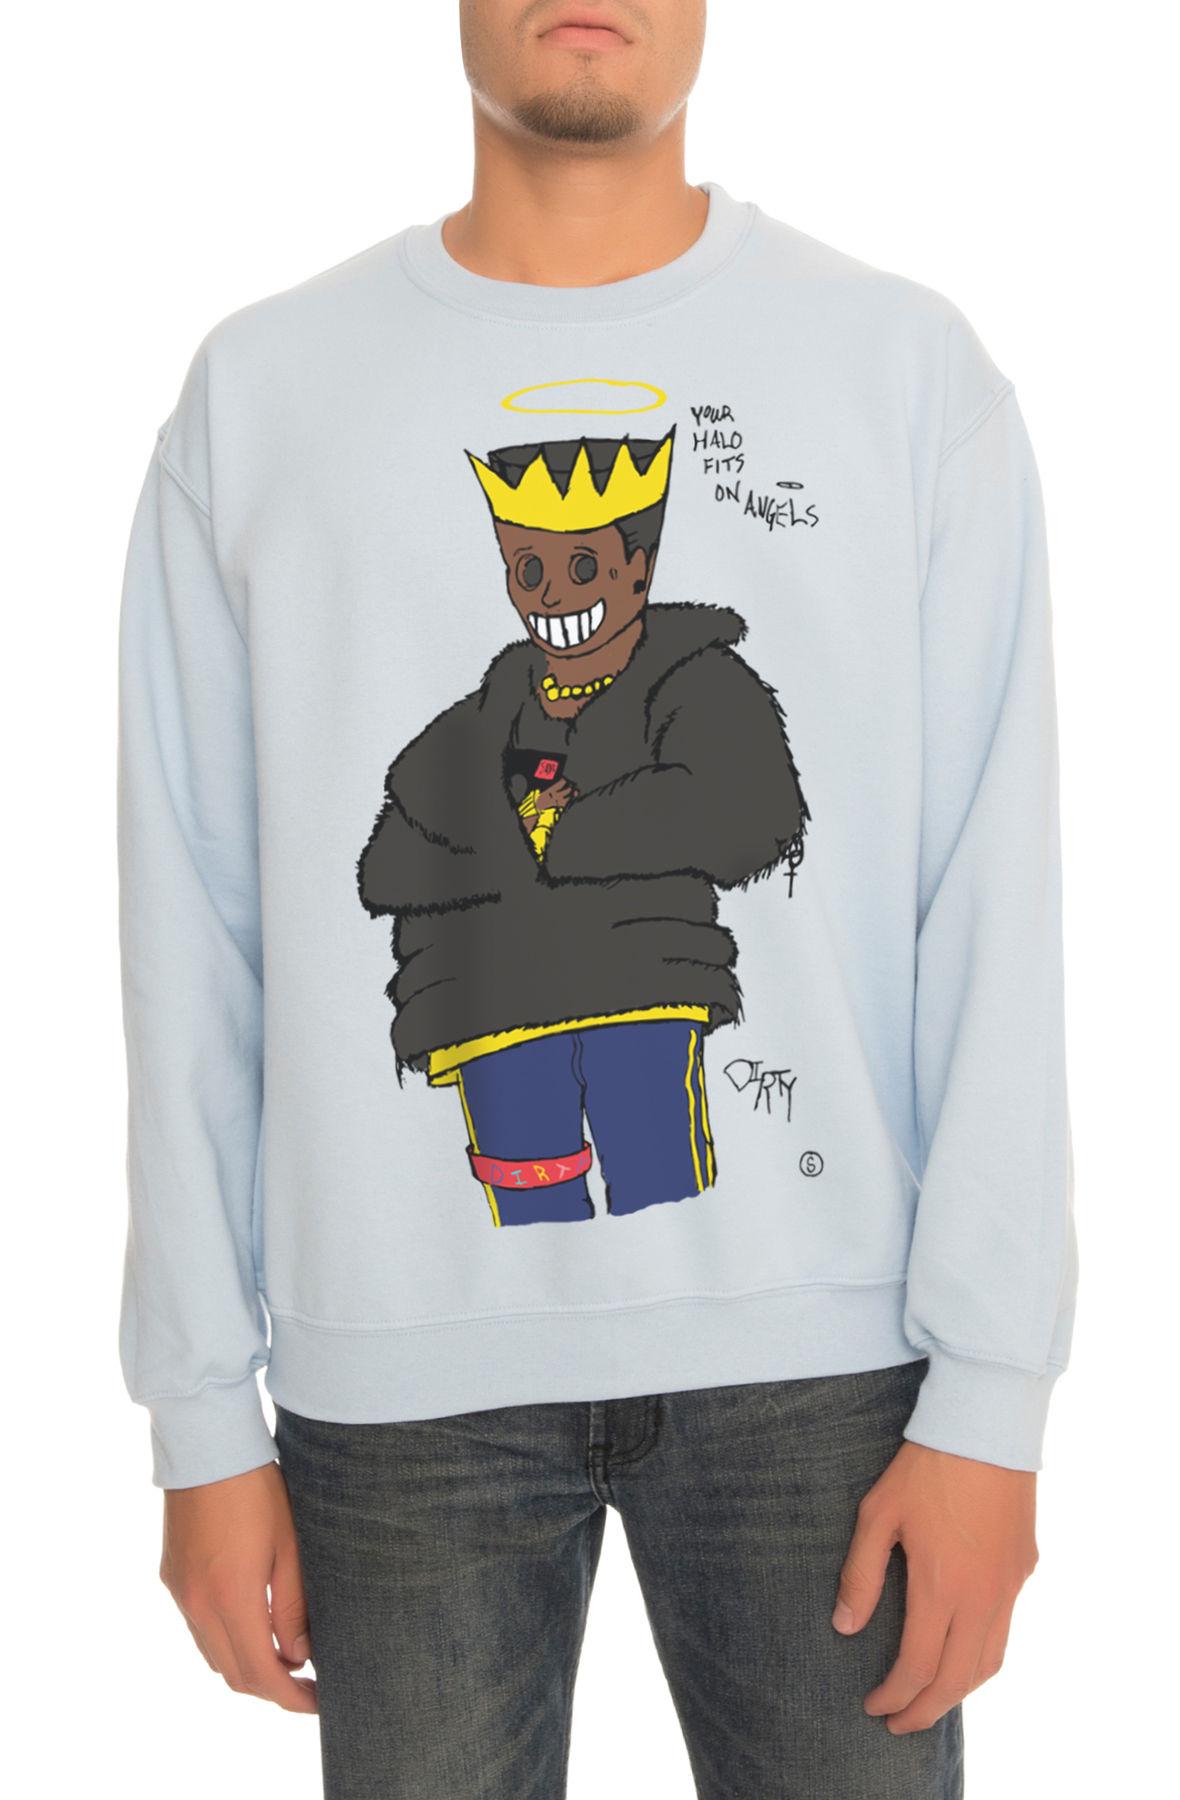 The Hey Low Crewneck Sweatshirt in Light Blue